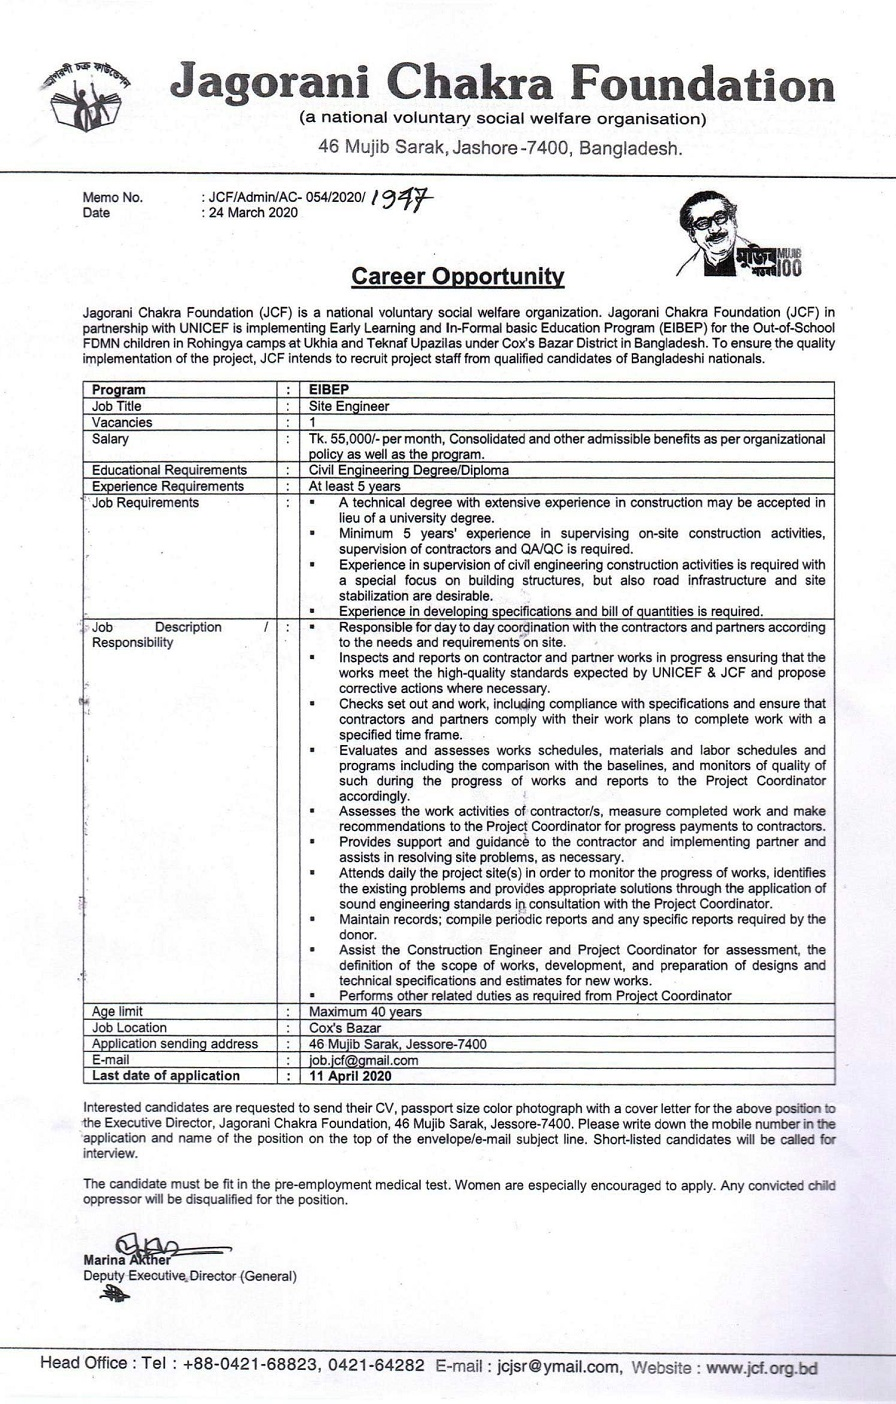 Jagorani Chakra Foundation Job Circular 2020  NGO Job Circular 1